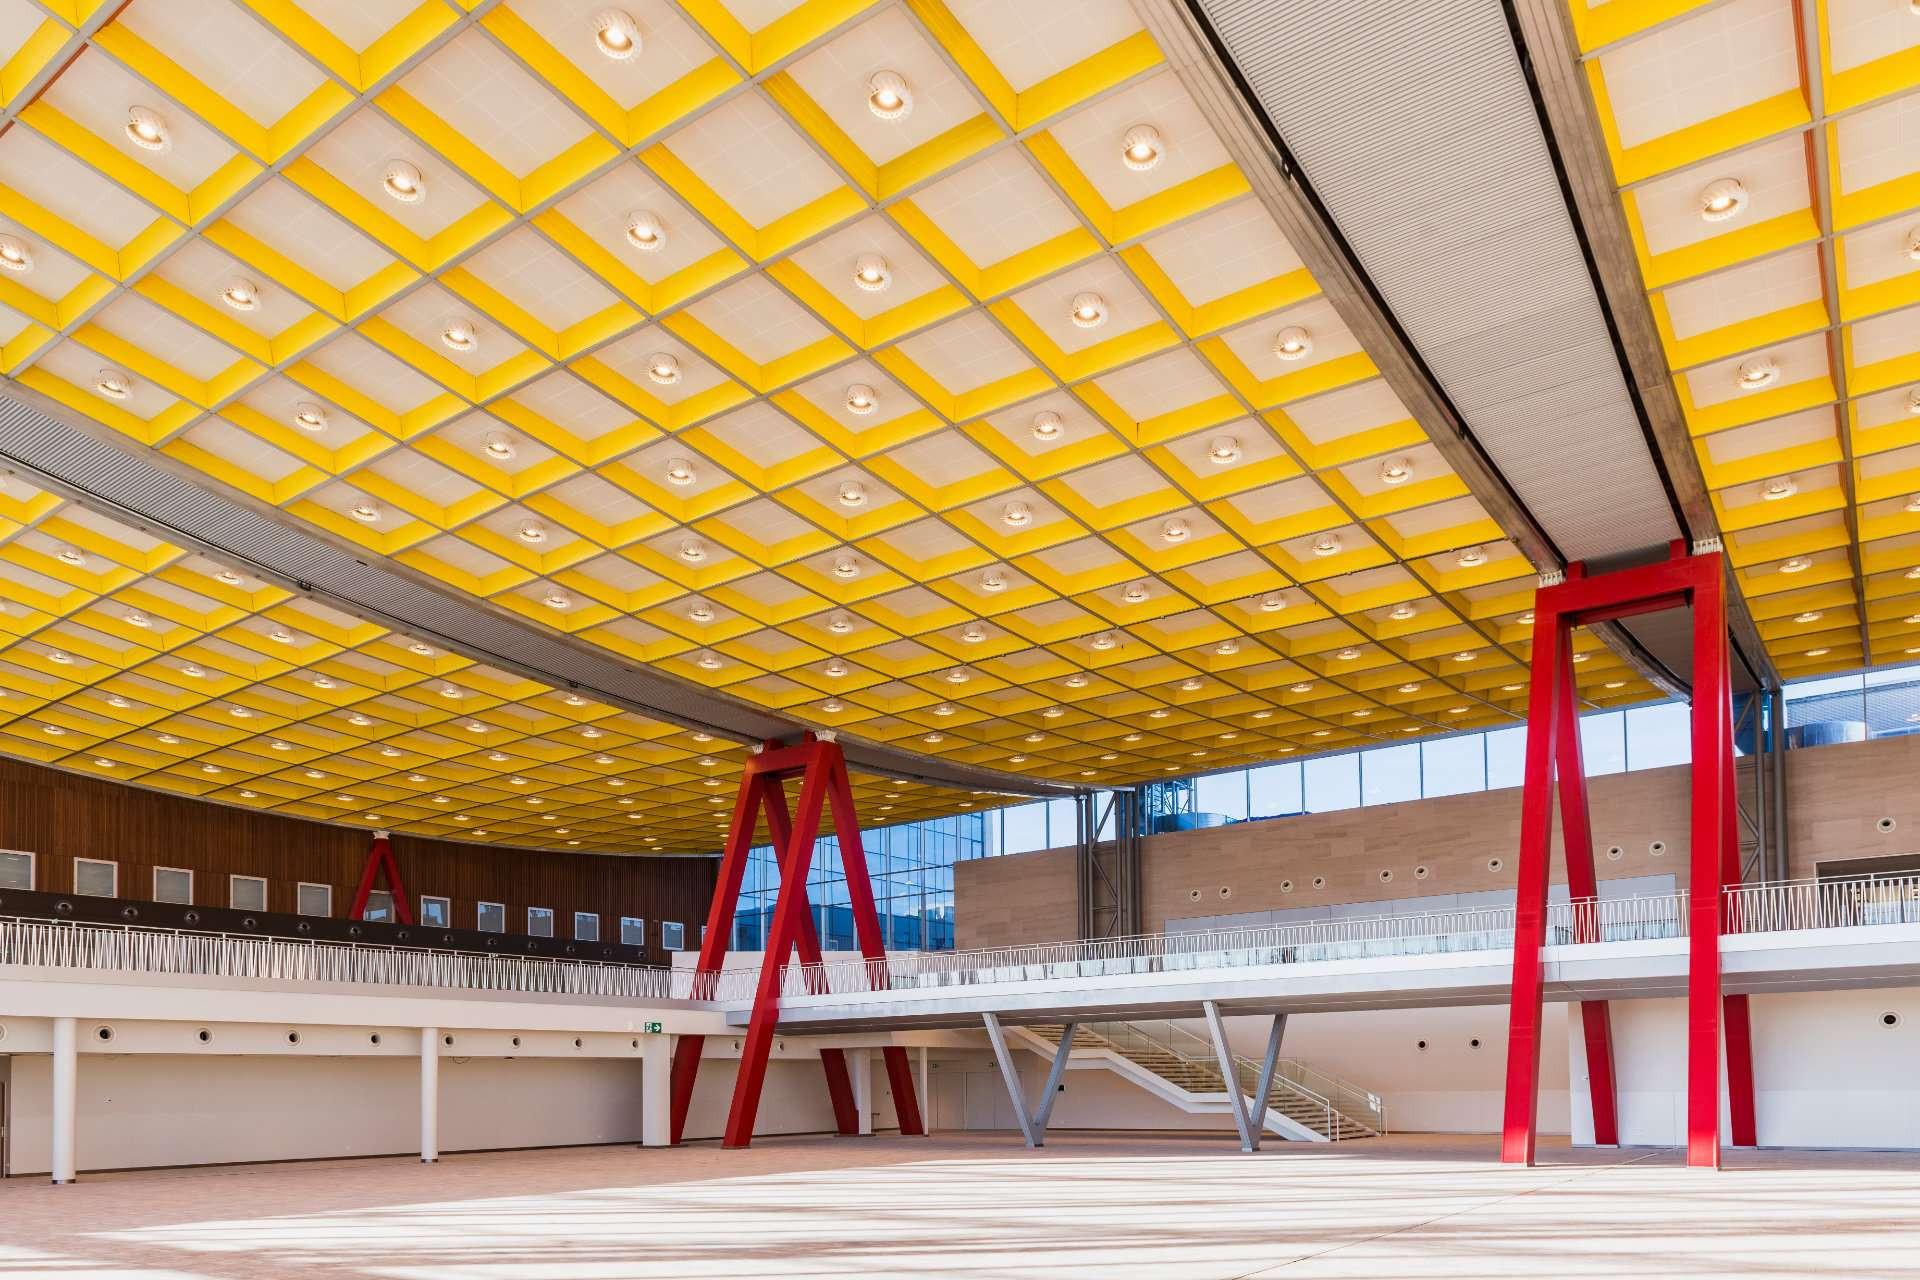 plafonds-Skyhall-Zaventem-2